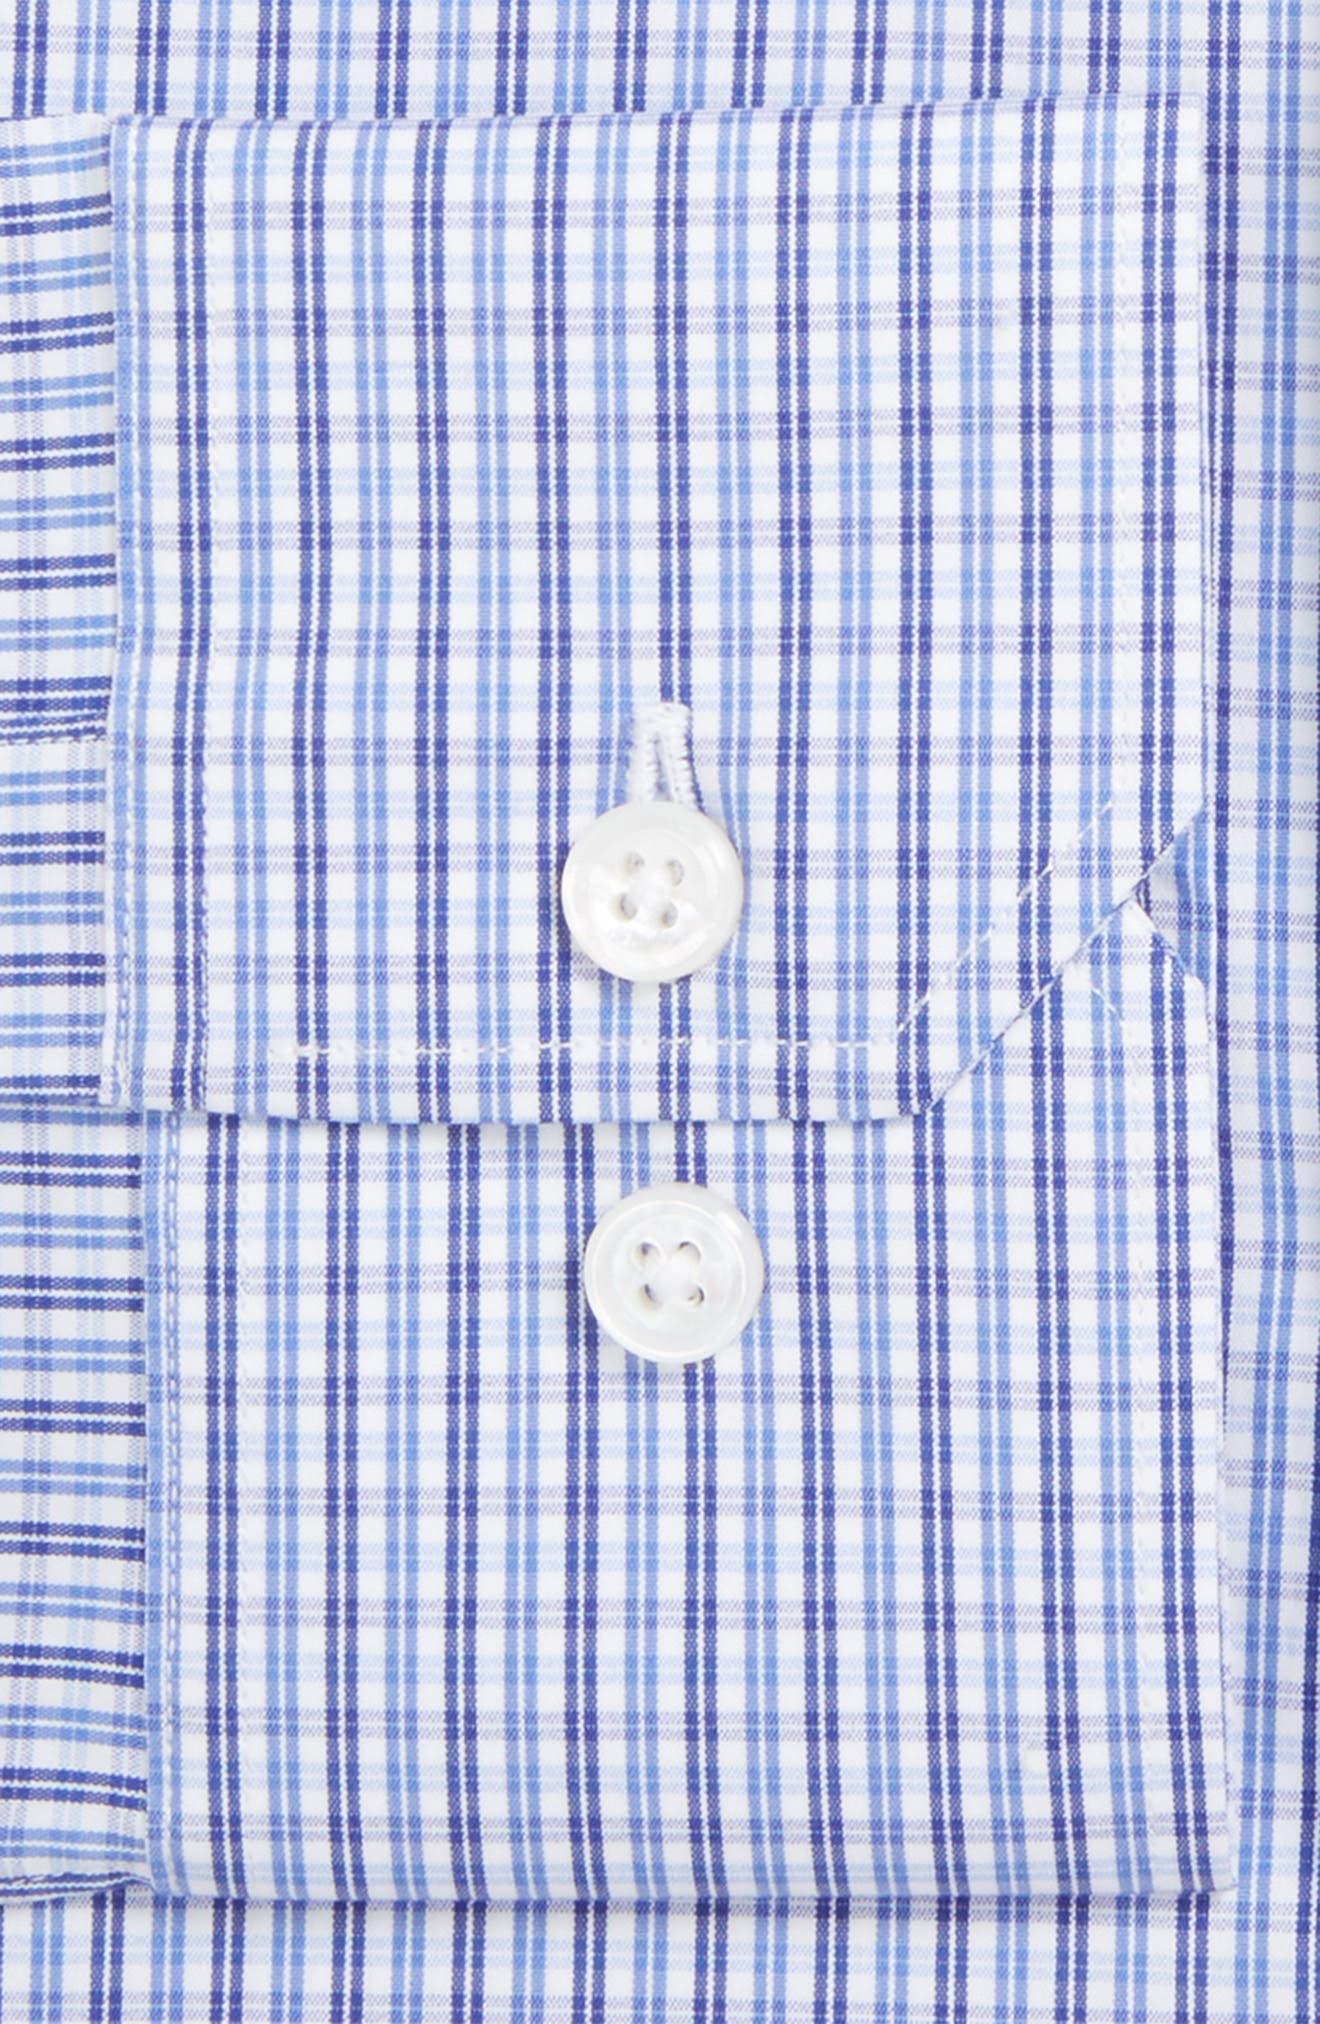 Jetsetter Slim Fit Check Stretch Dress Shirt,                             Main thumbnail 1, color,                             400